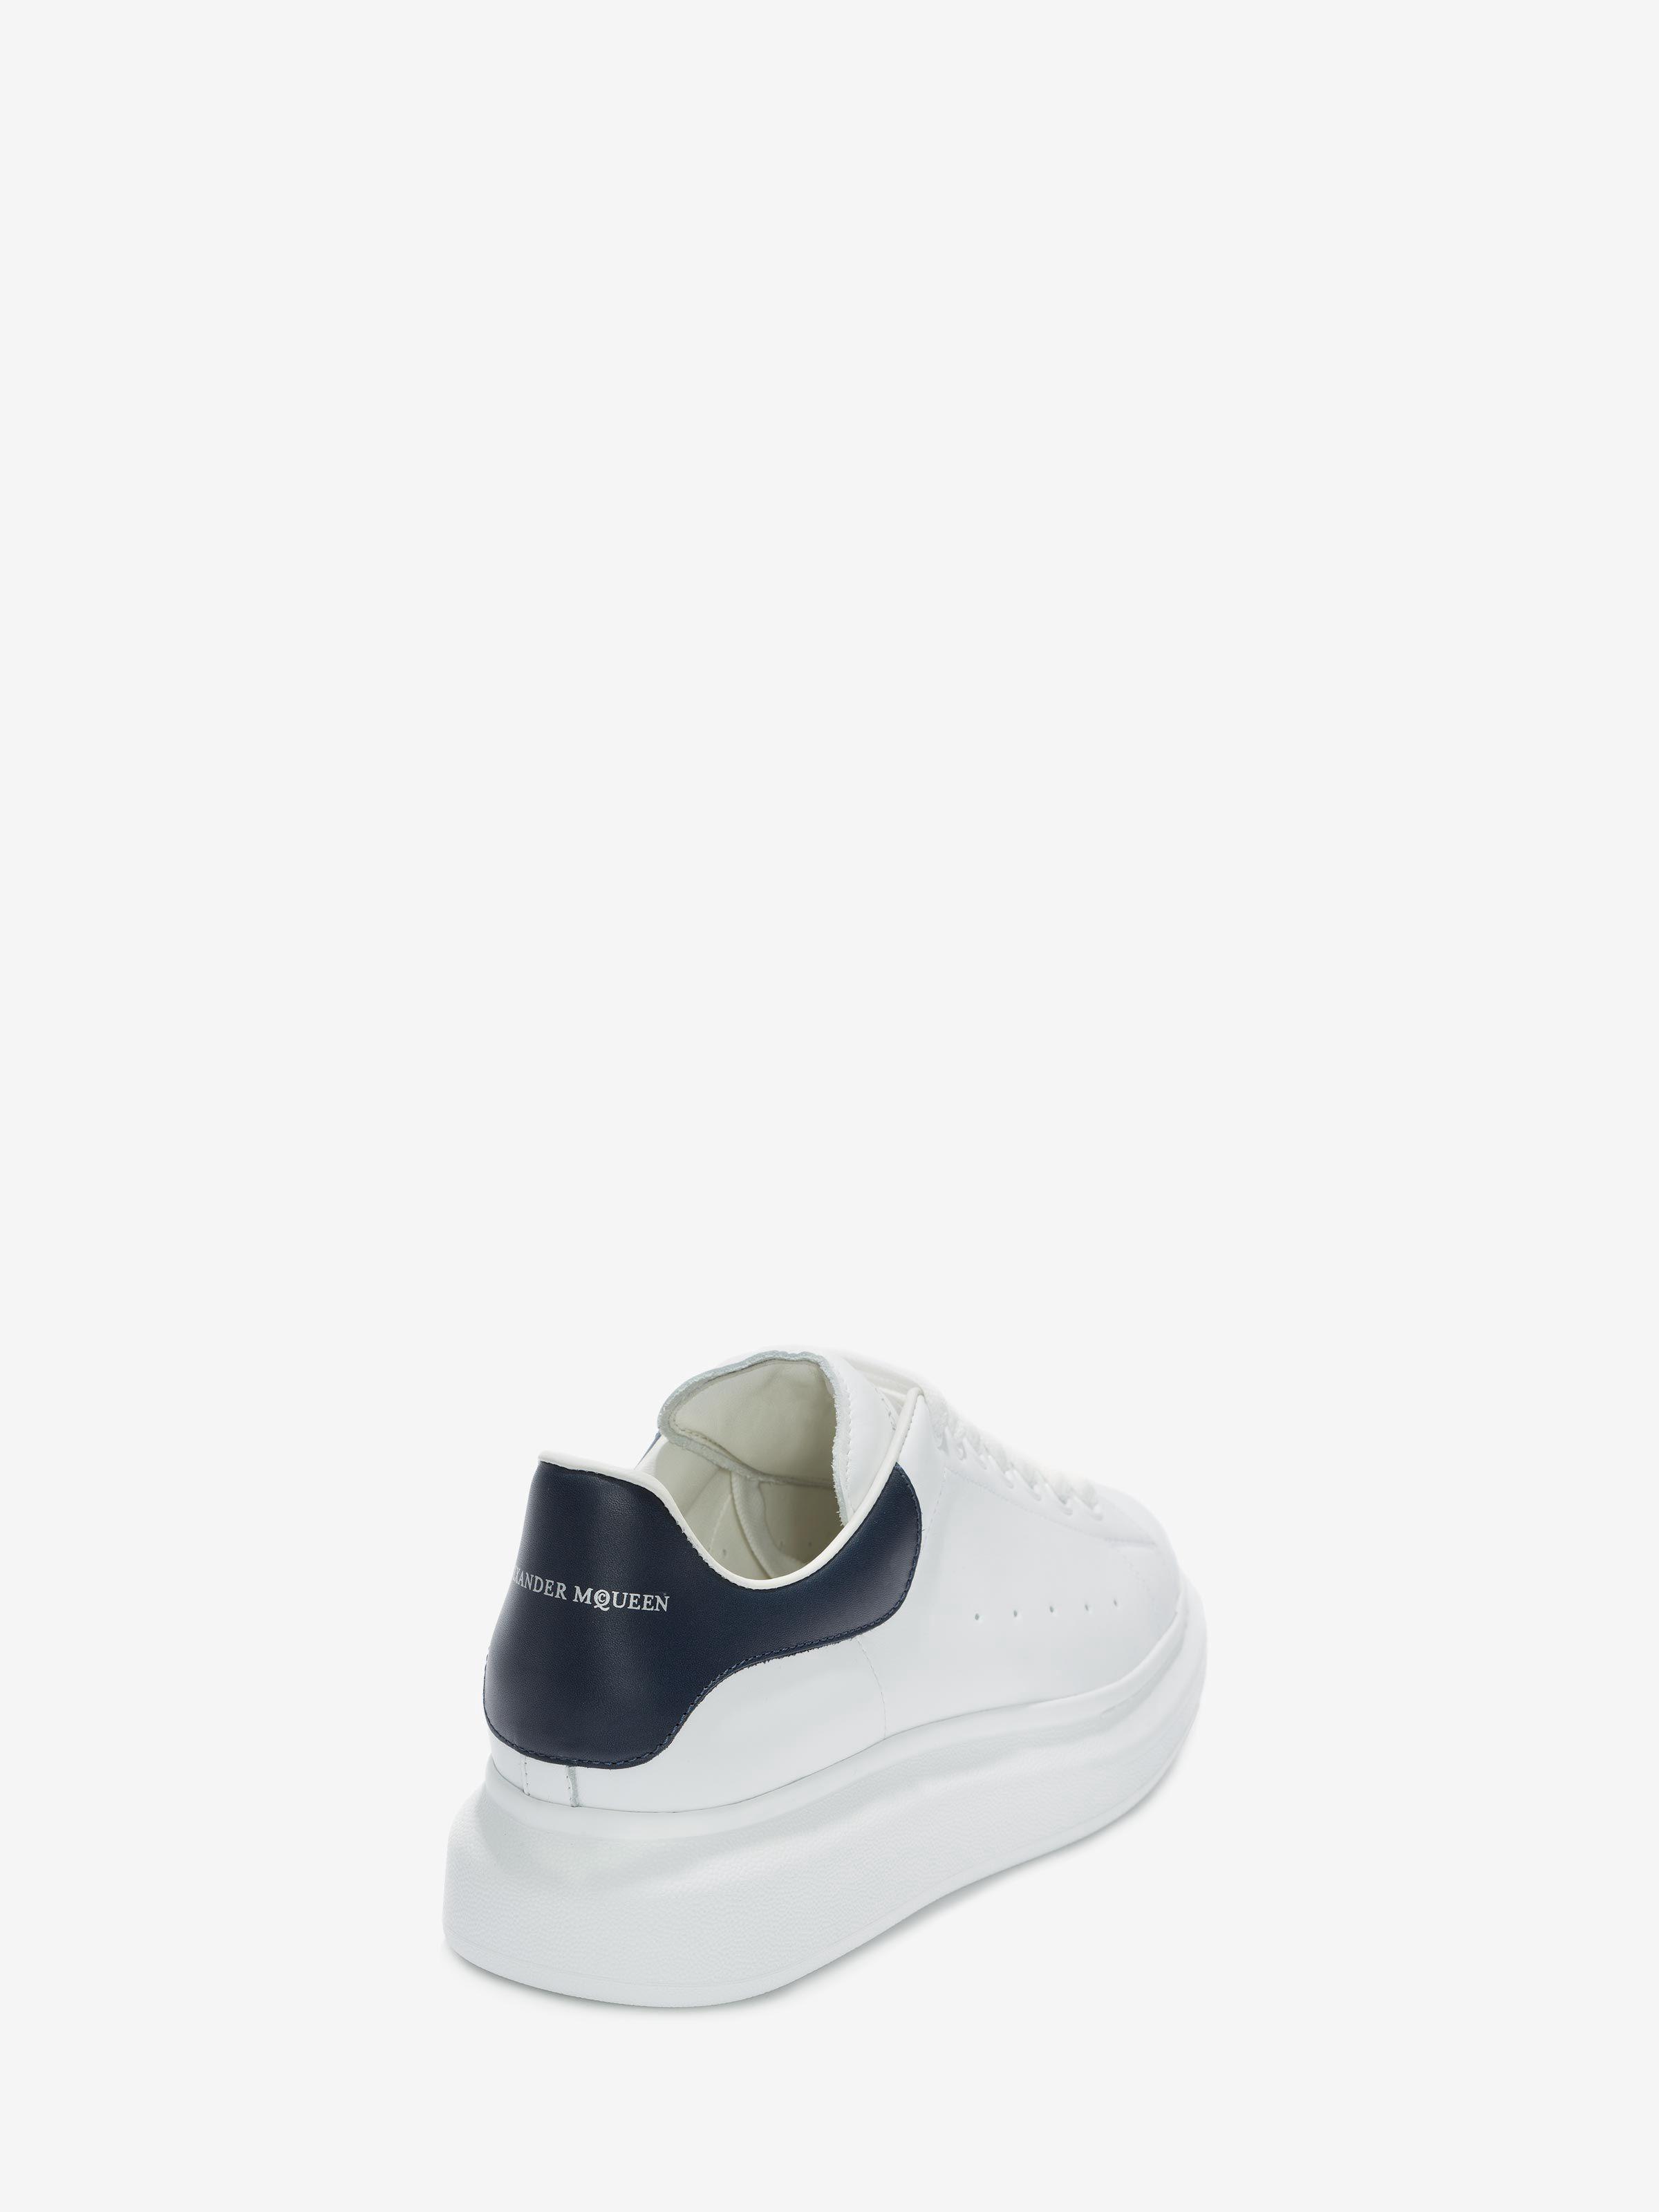 Alexander Mcqueen Oversized Sneaker - Blue/Navy 39 Navy Blue ...